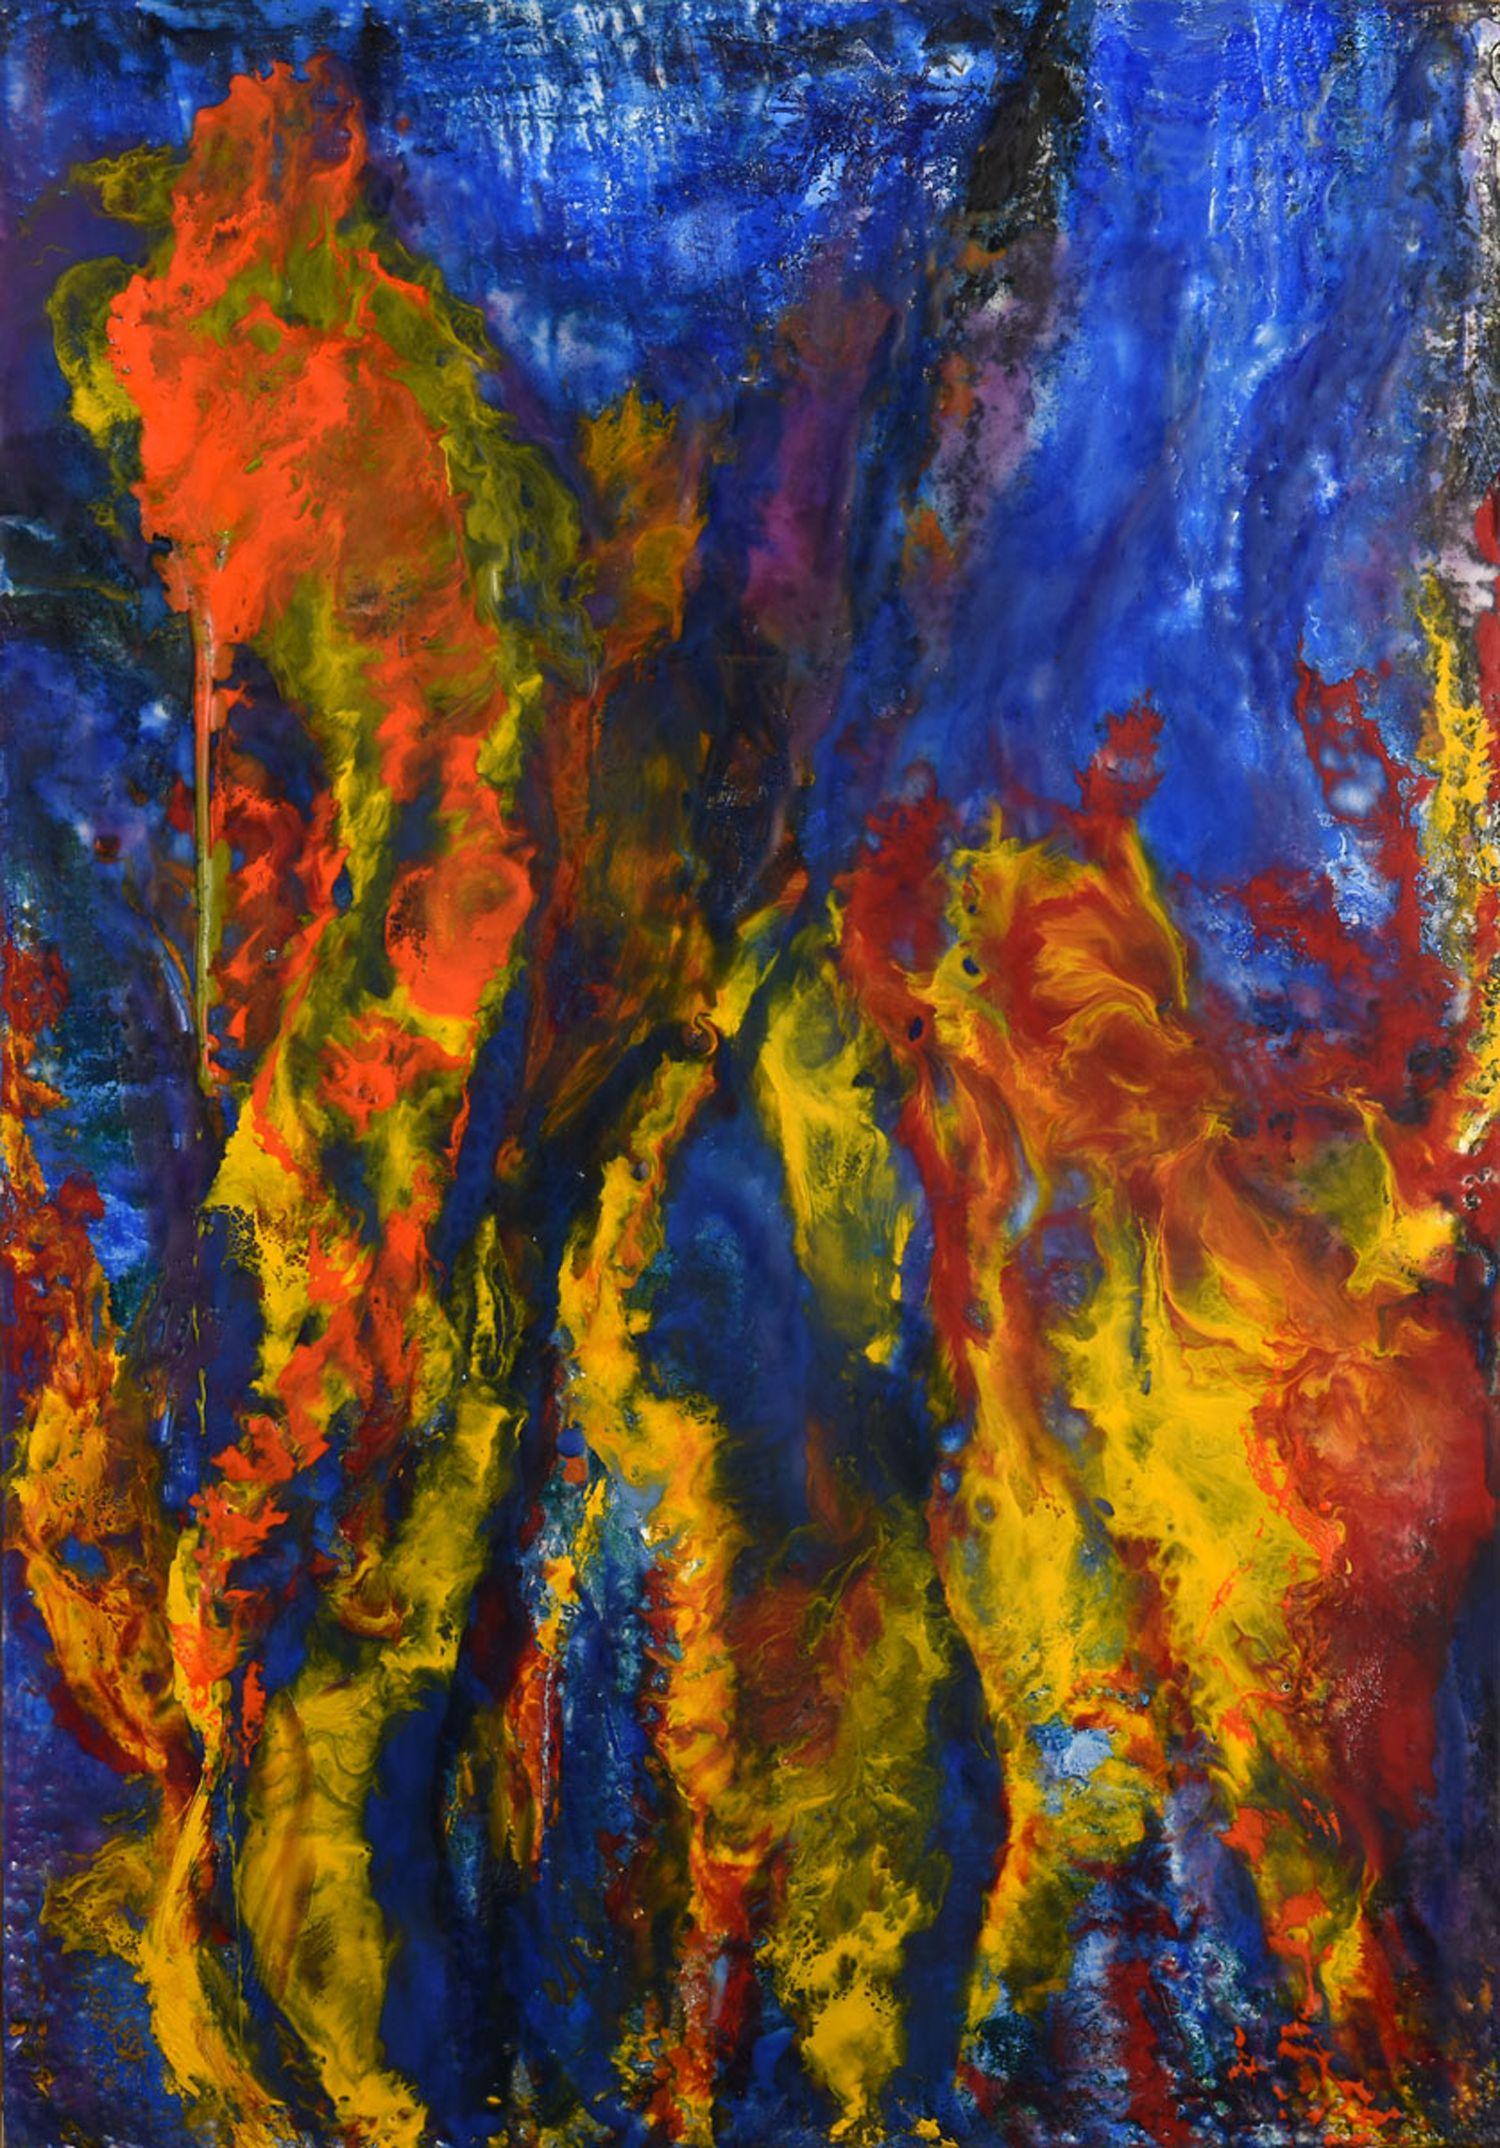 Blazes_painting_by_Vibha_Nanda-compressor